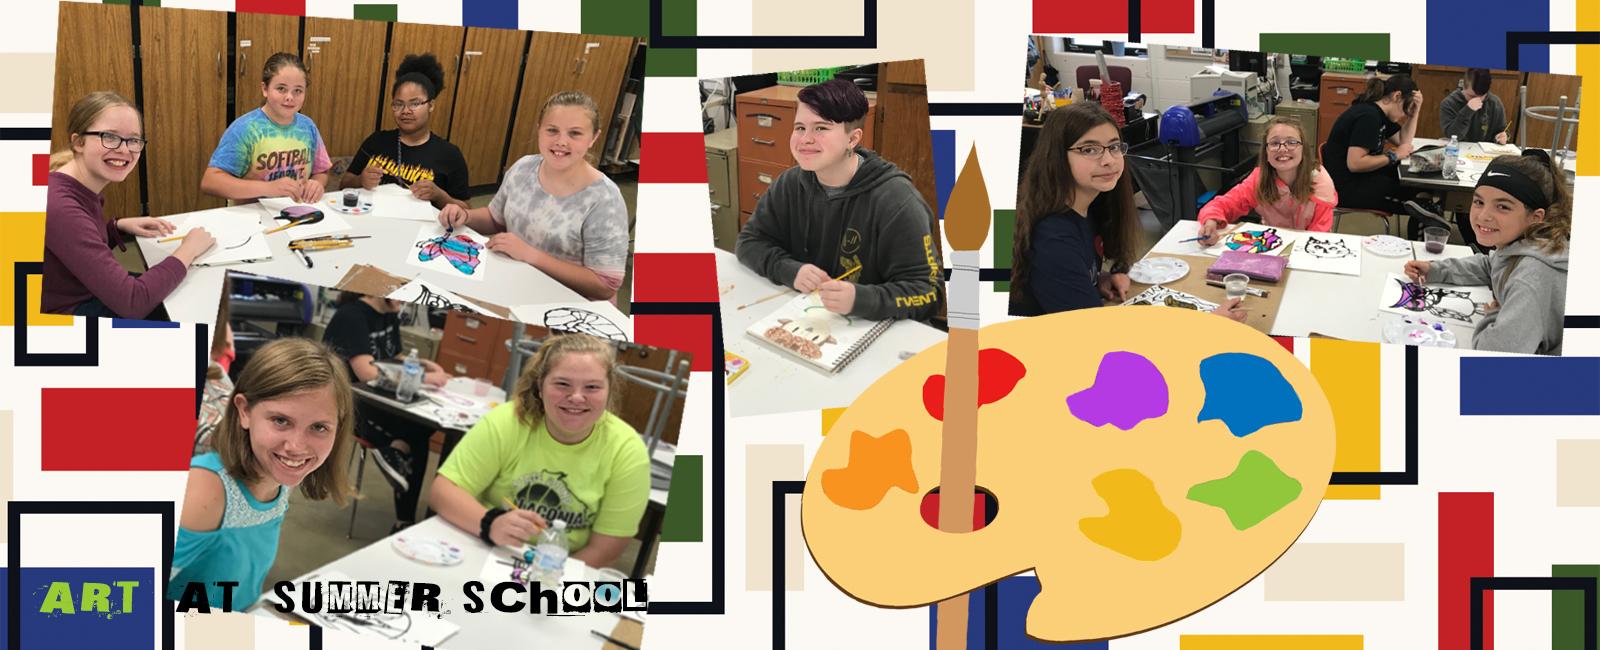 Art students at summer school